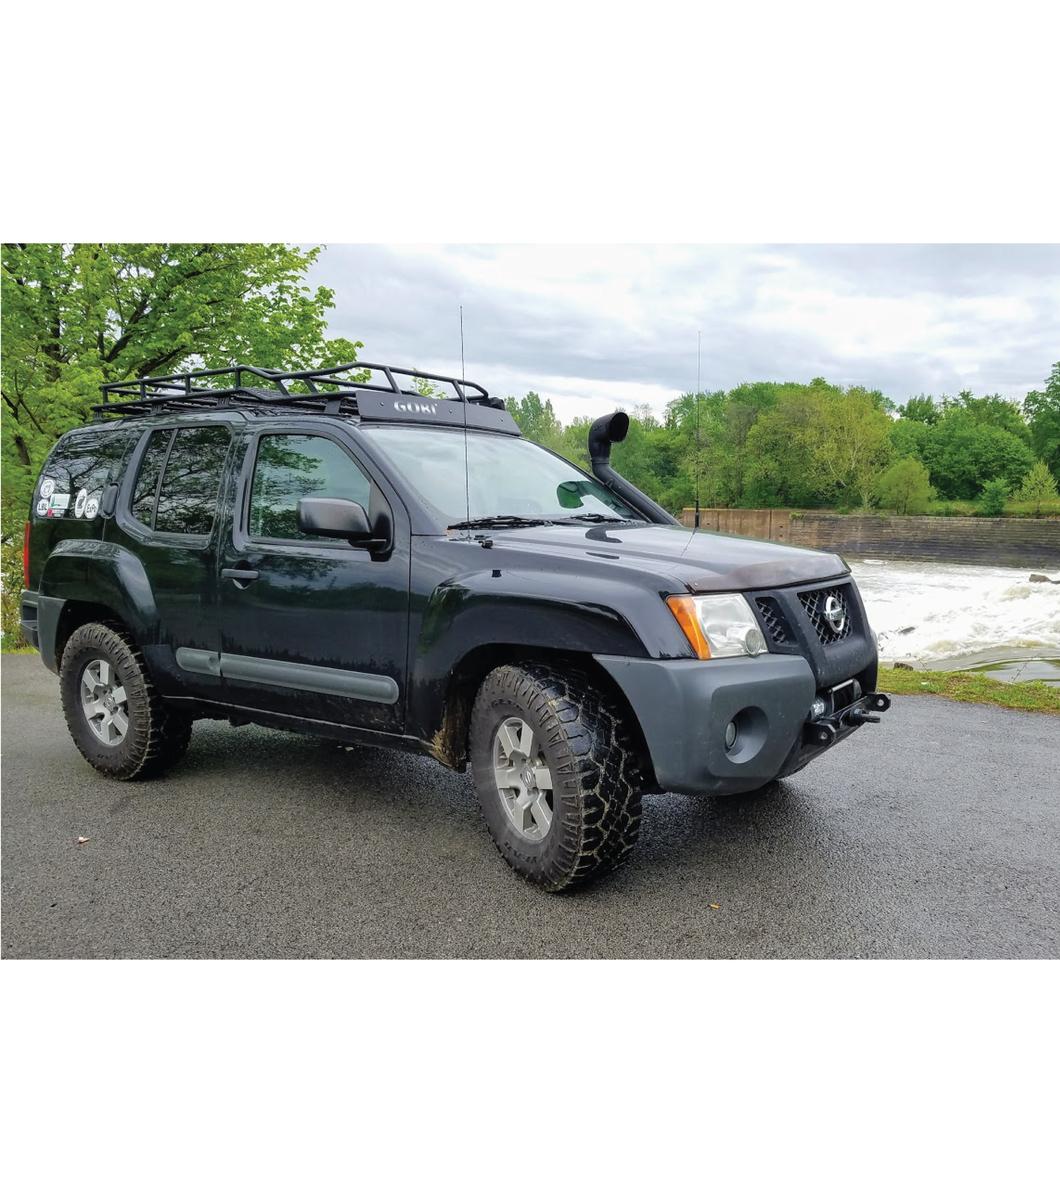 GOBI Nissan Xterra 00-04 Ranger Rack. Webp.net-resizeimage-39